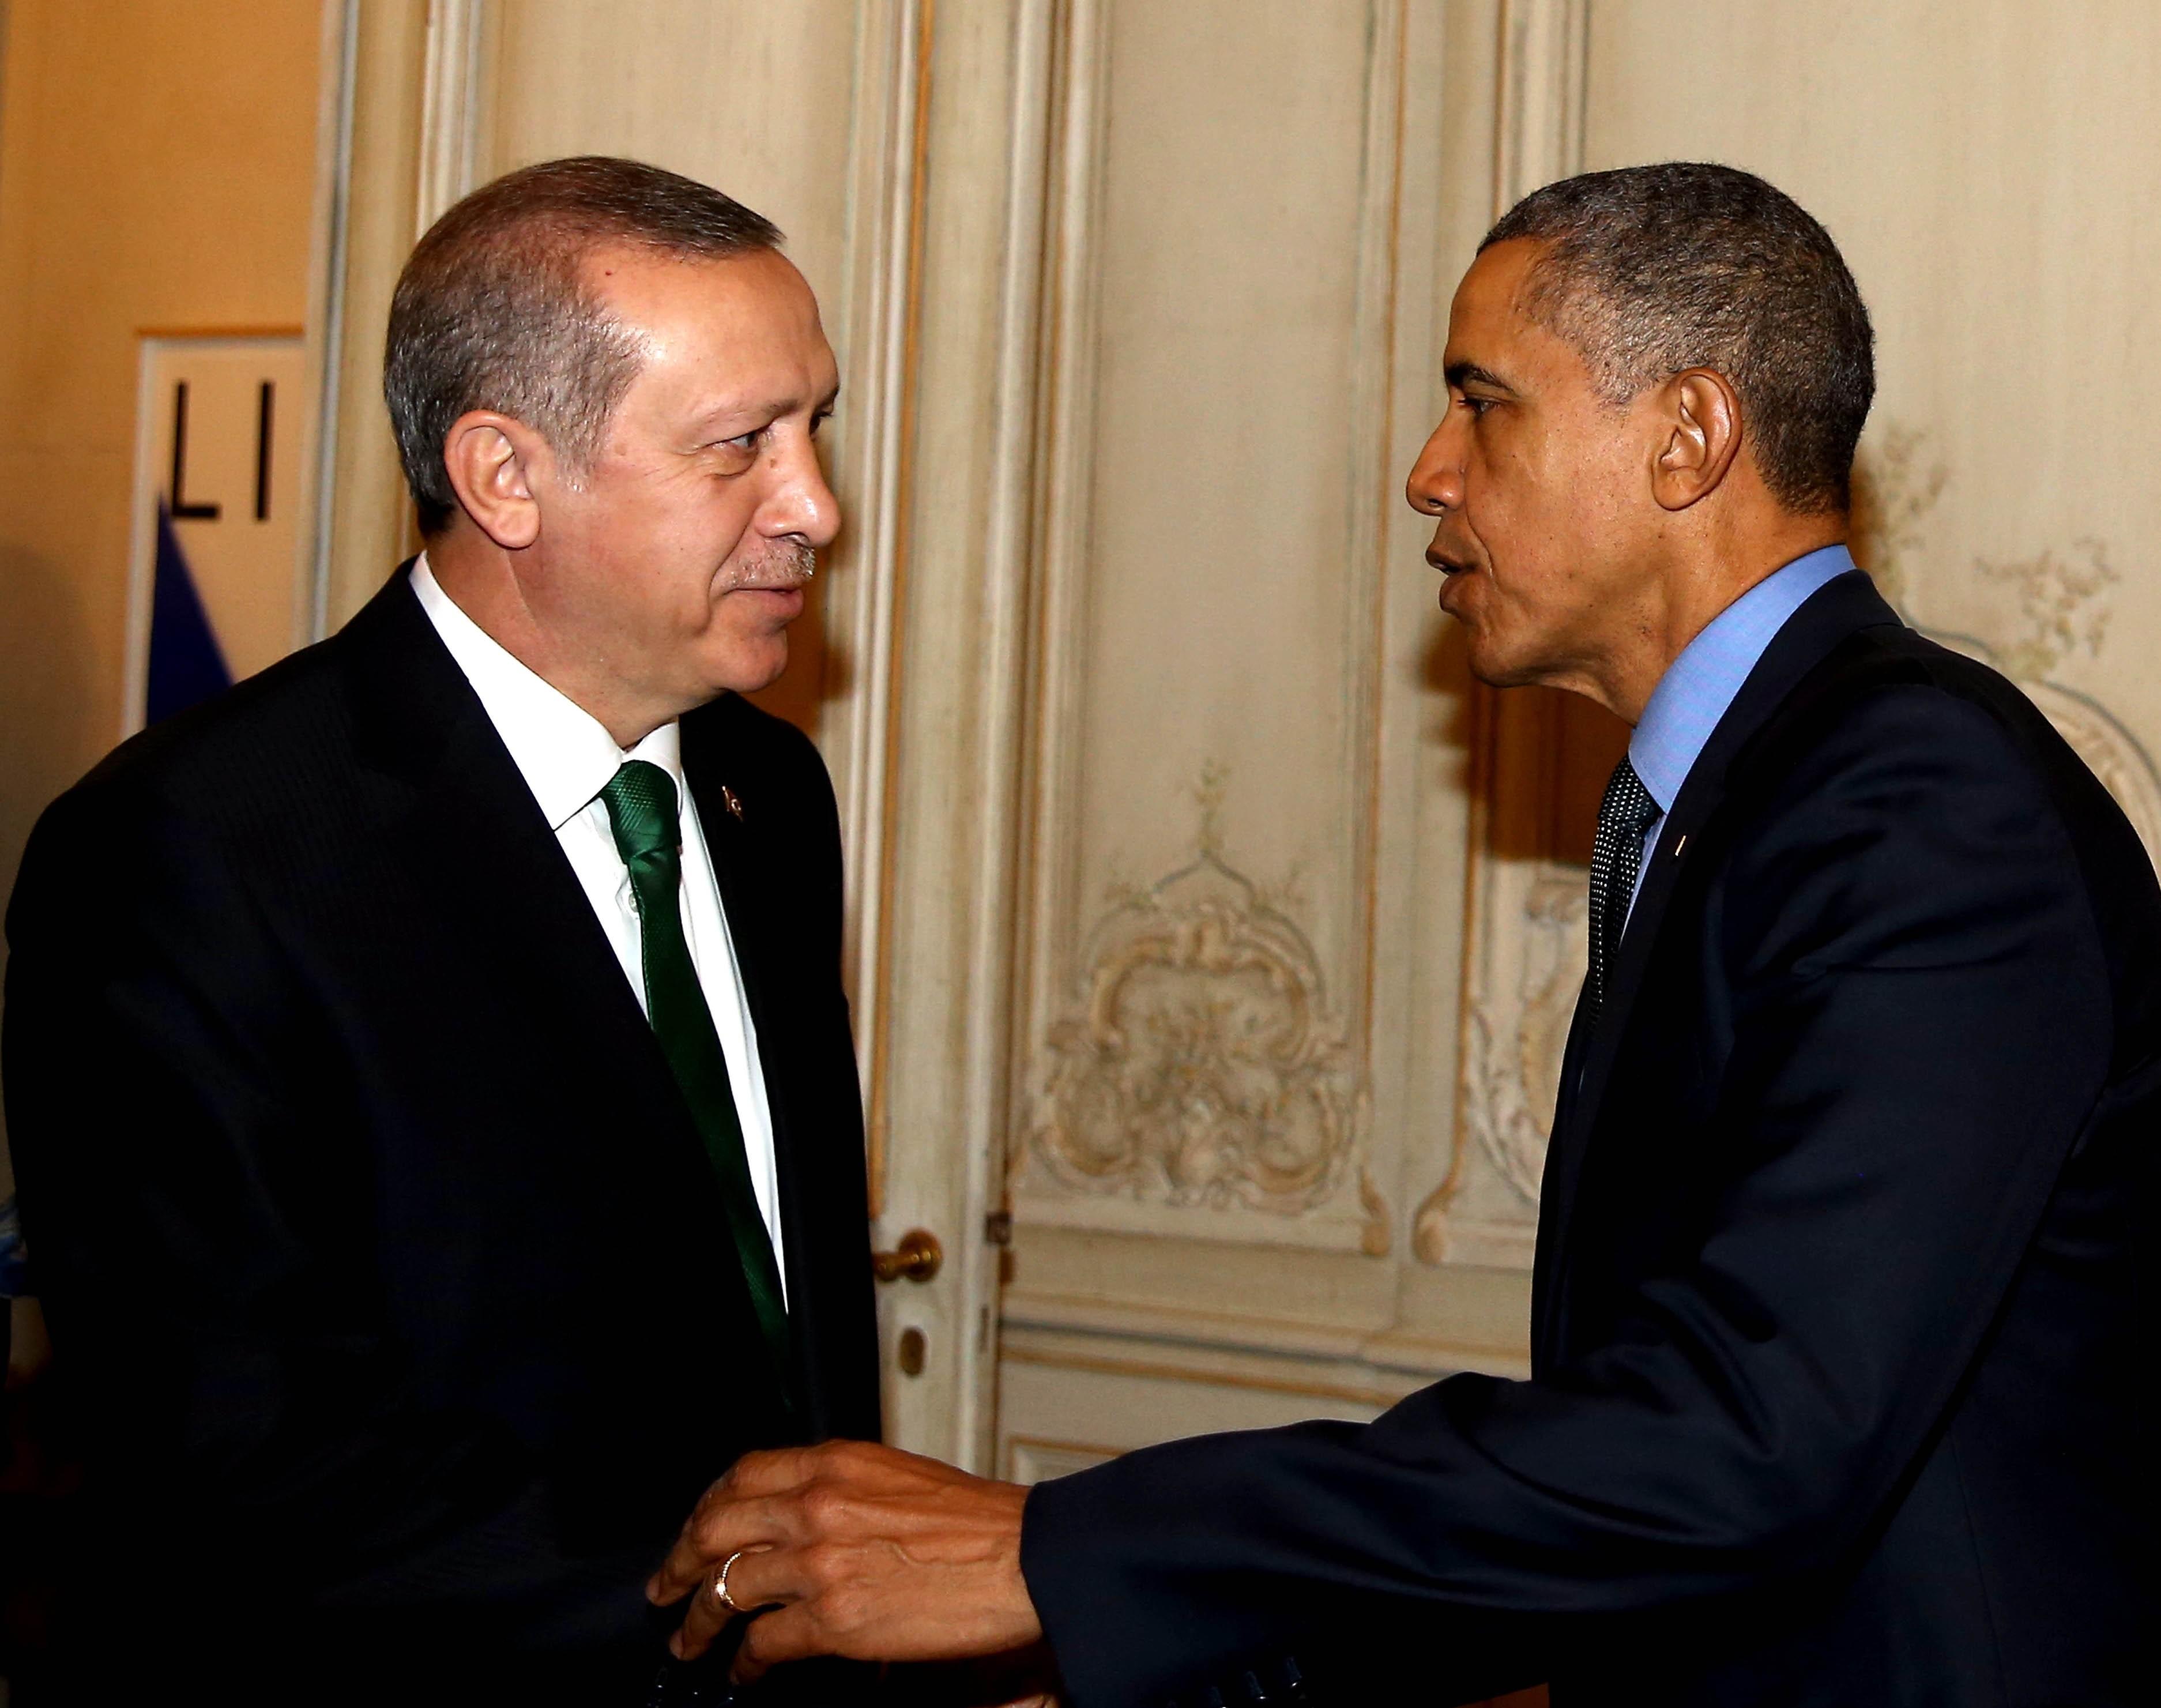 Recep Tayyip Erdogan - Barack Obama meeting in Paris